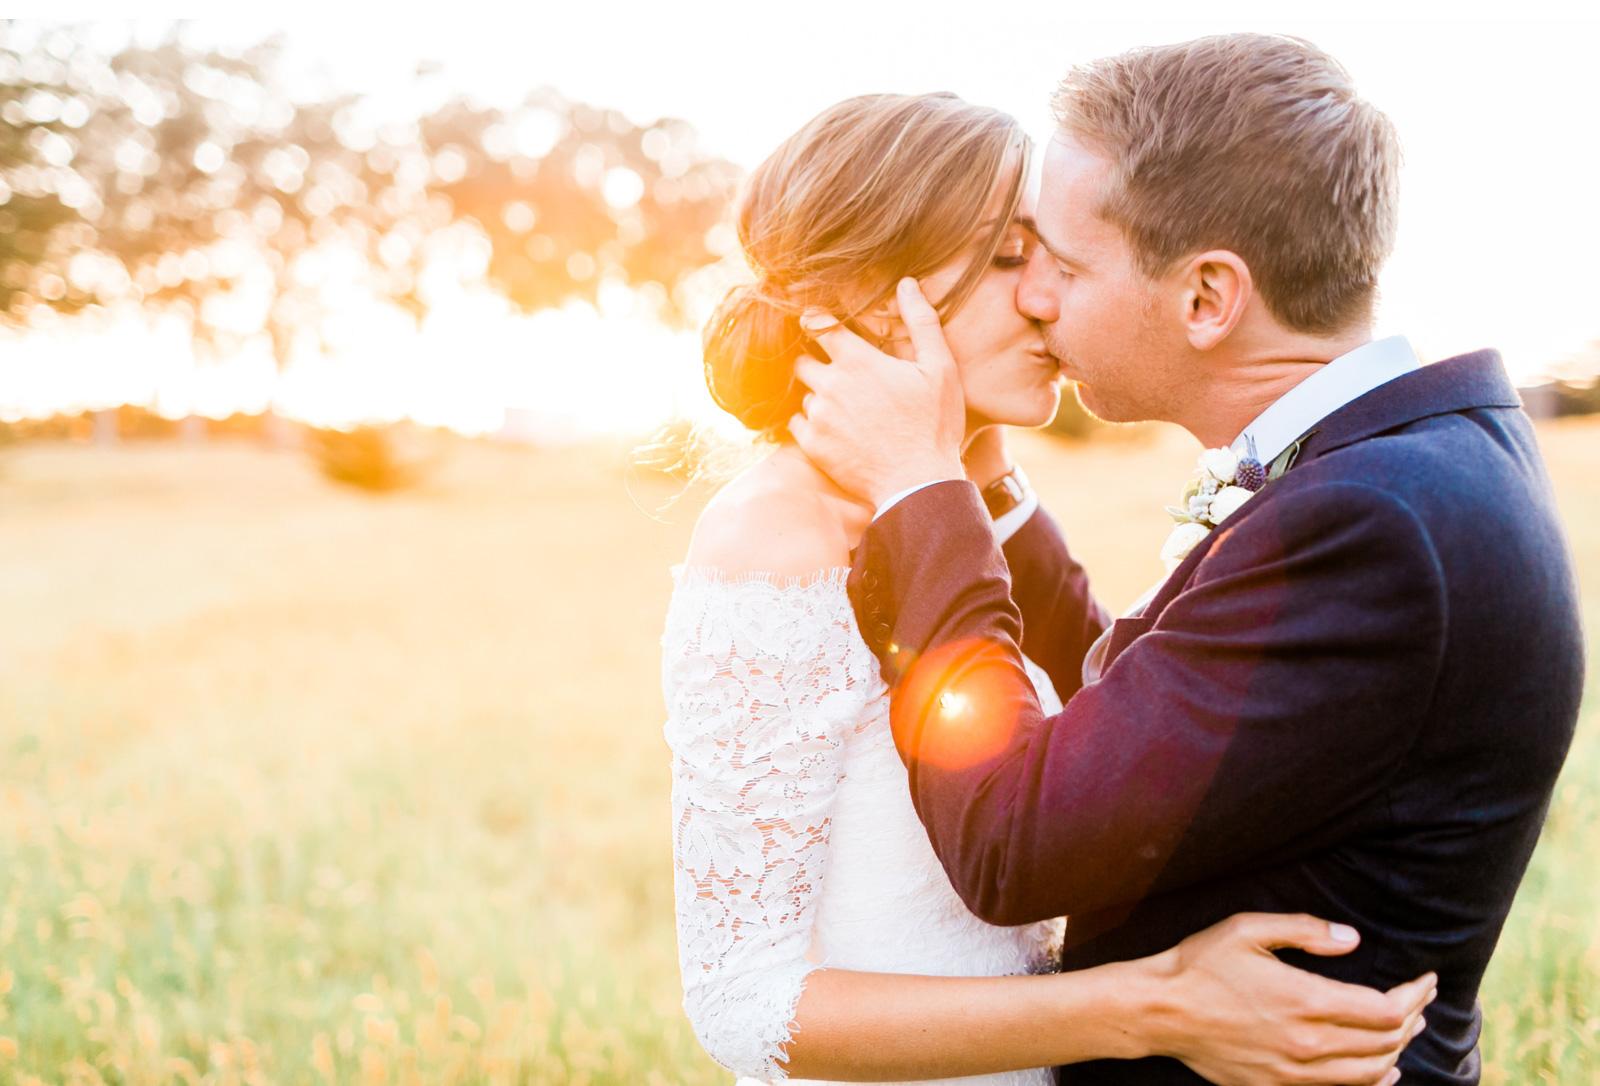 Natalie-Schutt-Photography-Adventure-Wedding-Mendocino_08.jpg